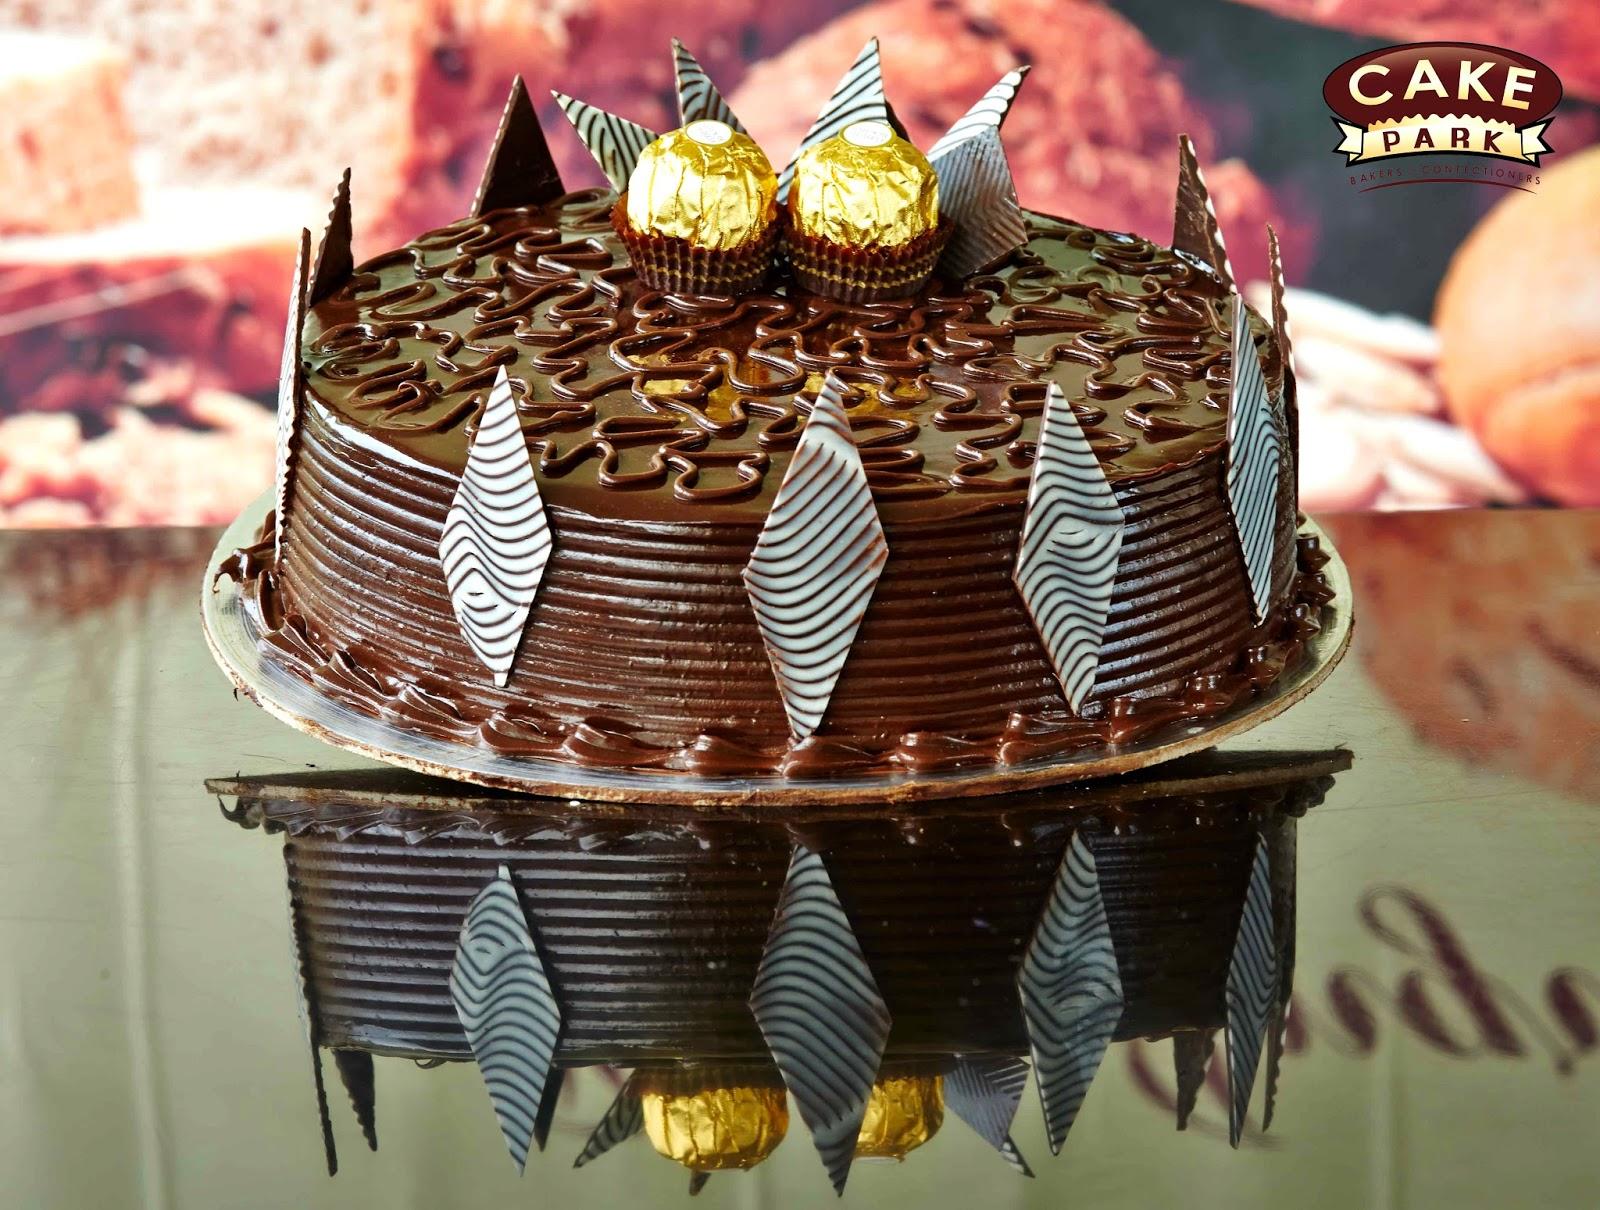 Cake Park Buy A Fresh Cream Cake Online Today